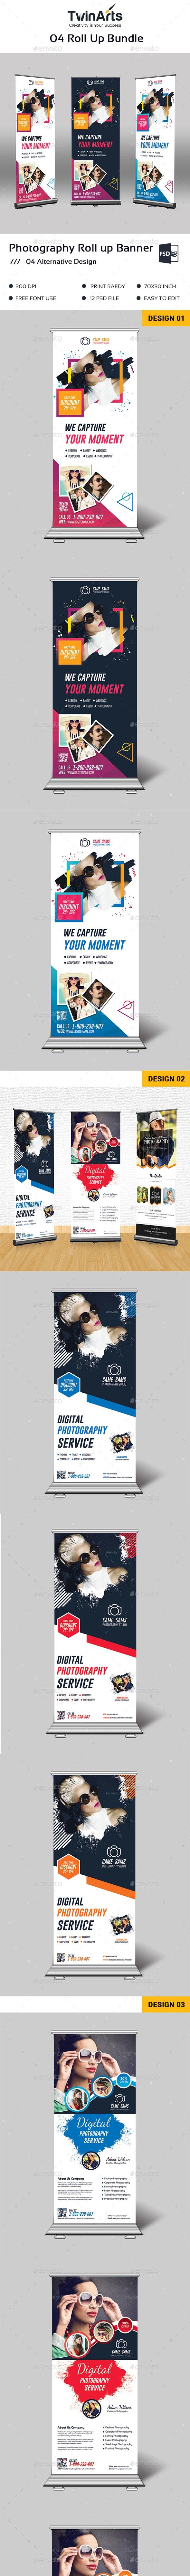 Roll Up Banner Bundle. - Signage Print Templates